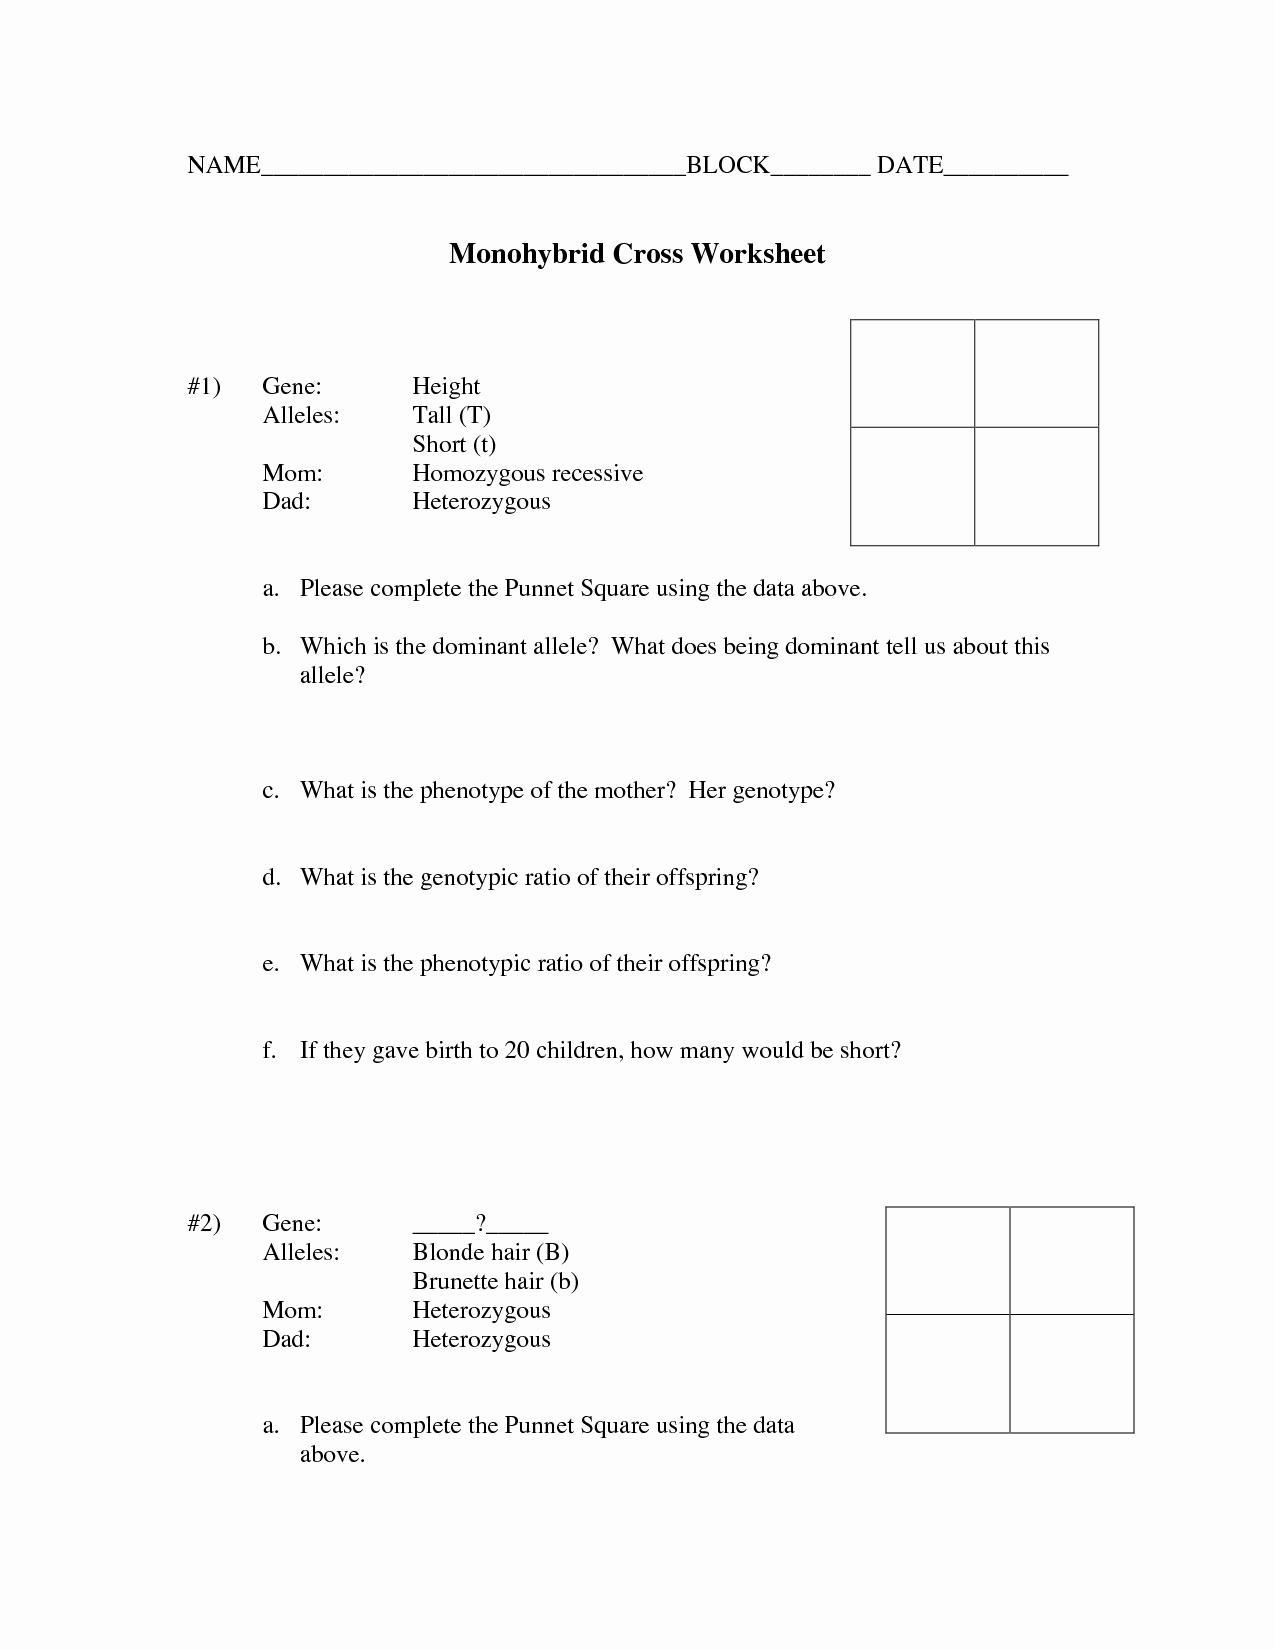 Monohybrid Cross Worksheet Answers Luxury Monohybrid Cross Worksheet Part D